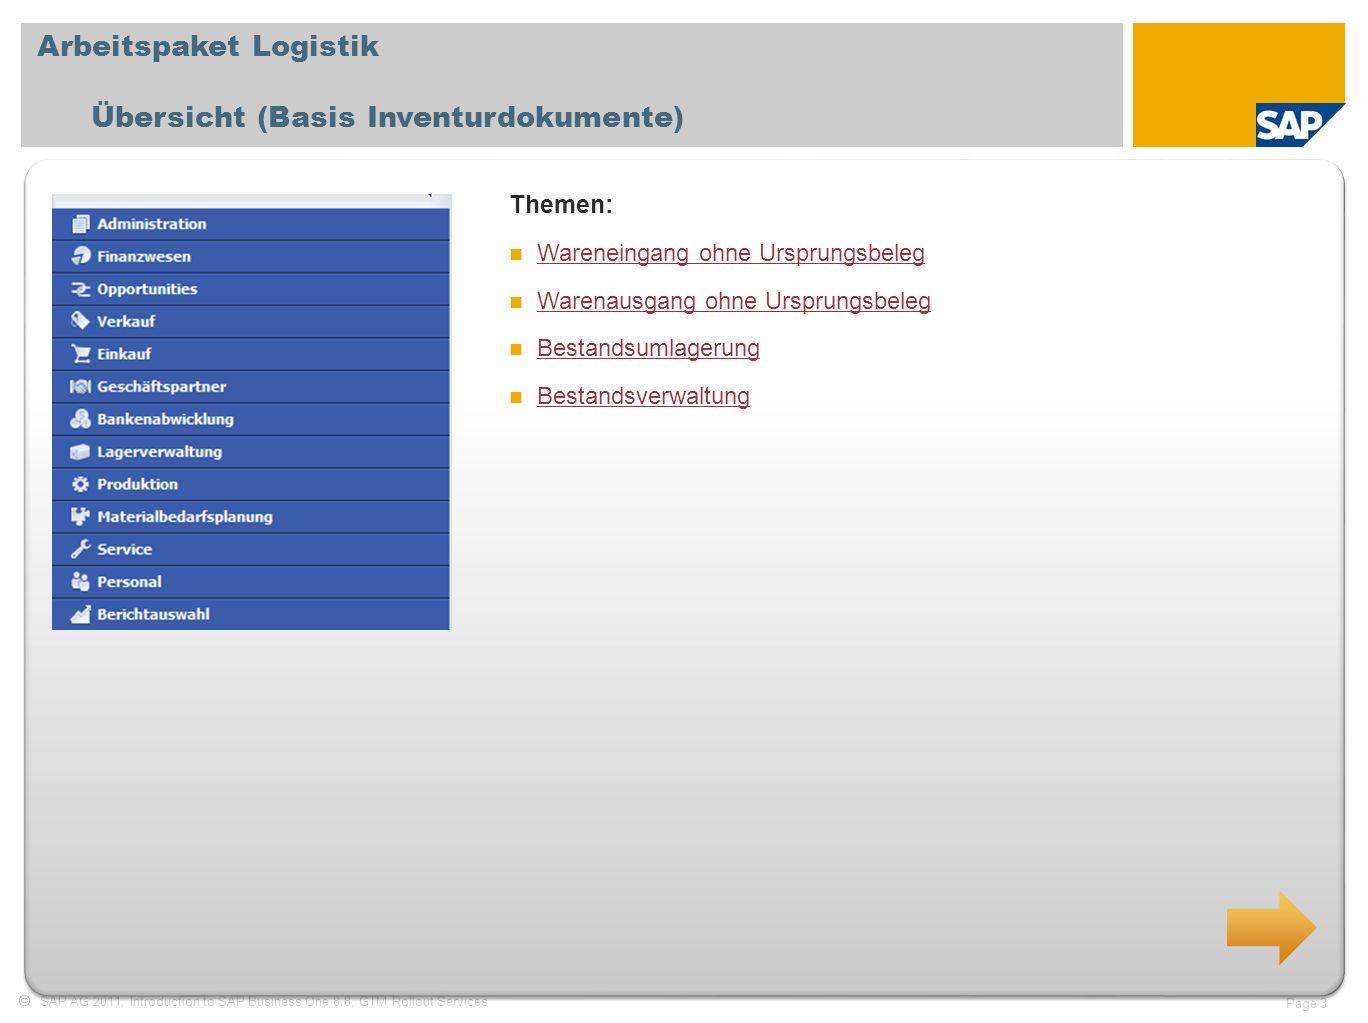 SAP AG 2011, Introduction to SAP Business One 8.8, GTM Rollout Services Page 3 Arbeitspaket Logistik Übersicht (Basis Inventurdokumente) Themen: Waren